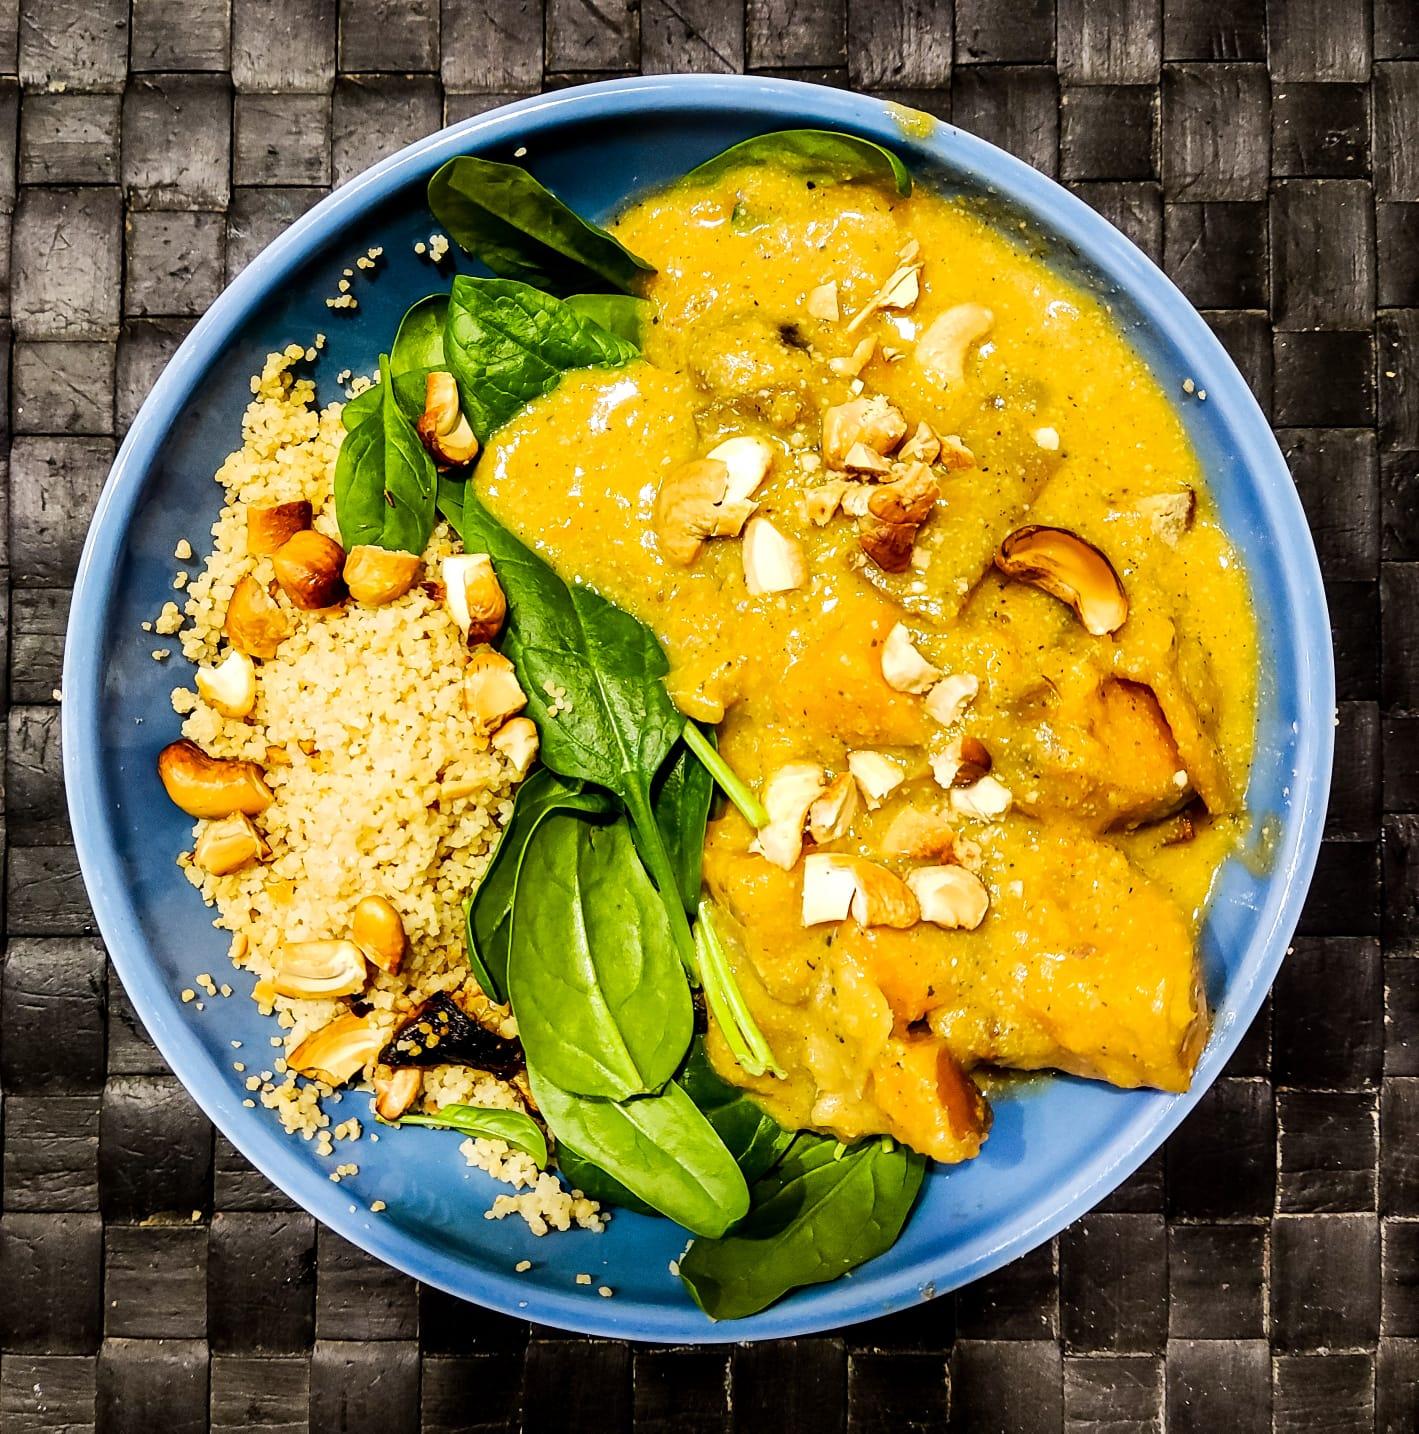 creamy-sweet-potato-stew-ingredients-vegan-recipe-ramona-debono